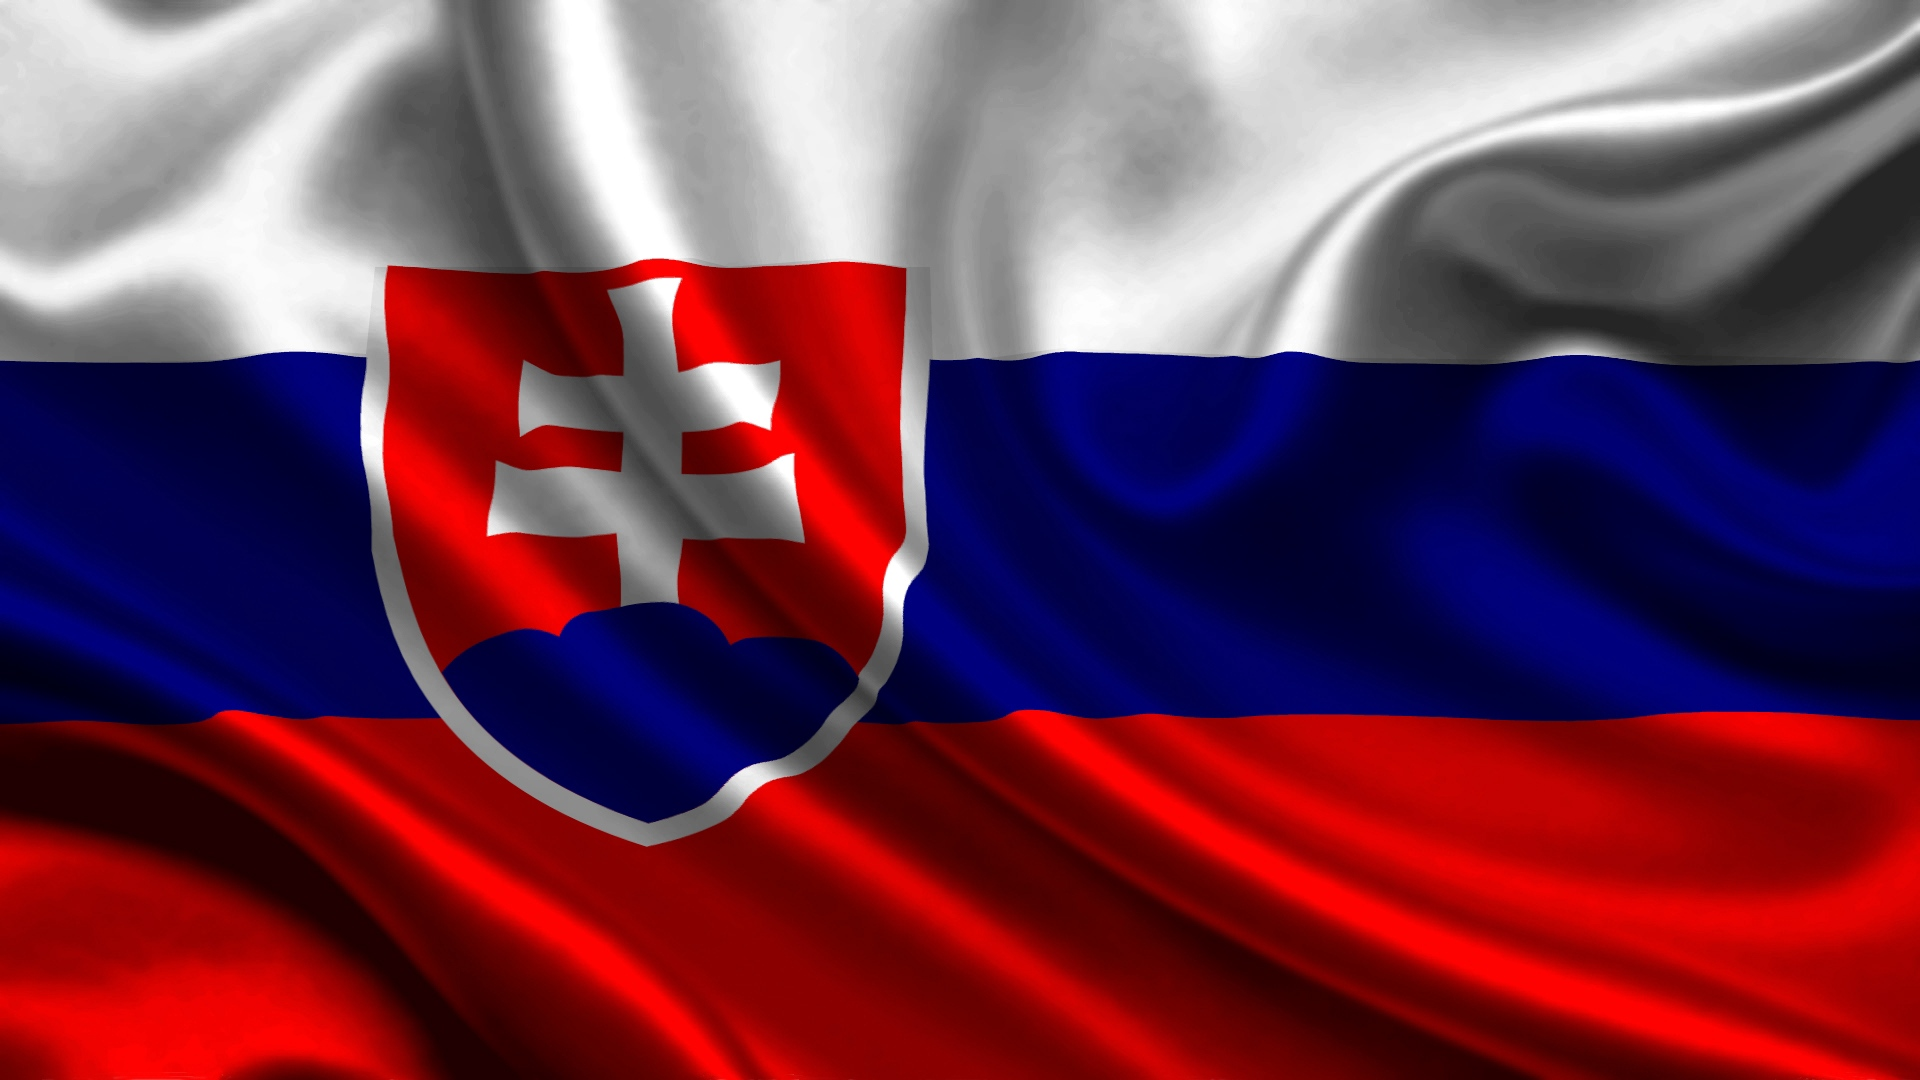 Slovakia Satin Flag   Stock Photos Images HD Wallpaper HD 1920x1080